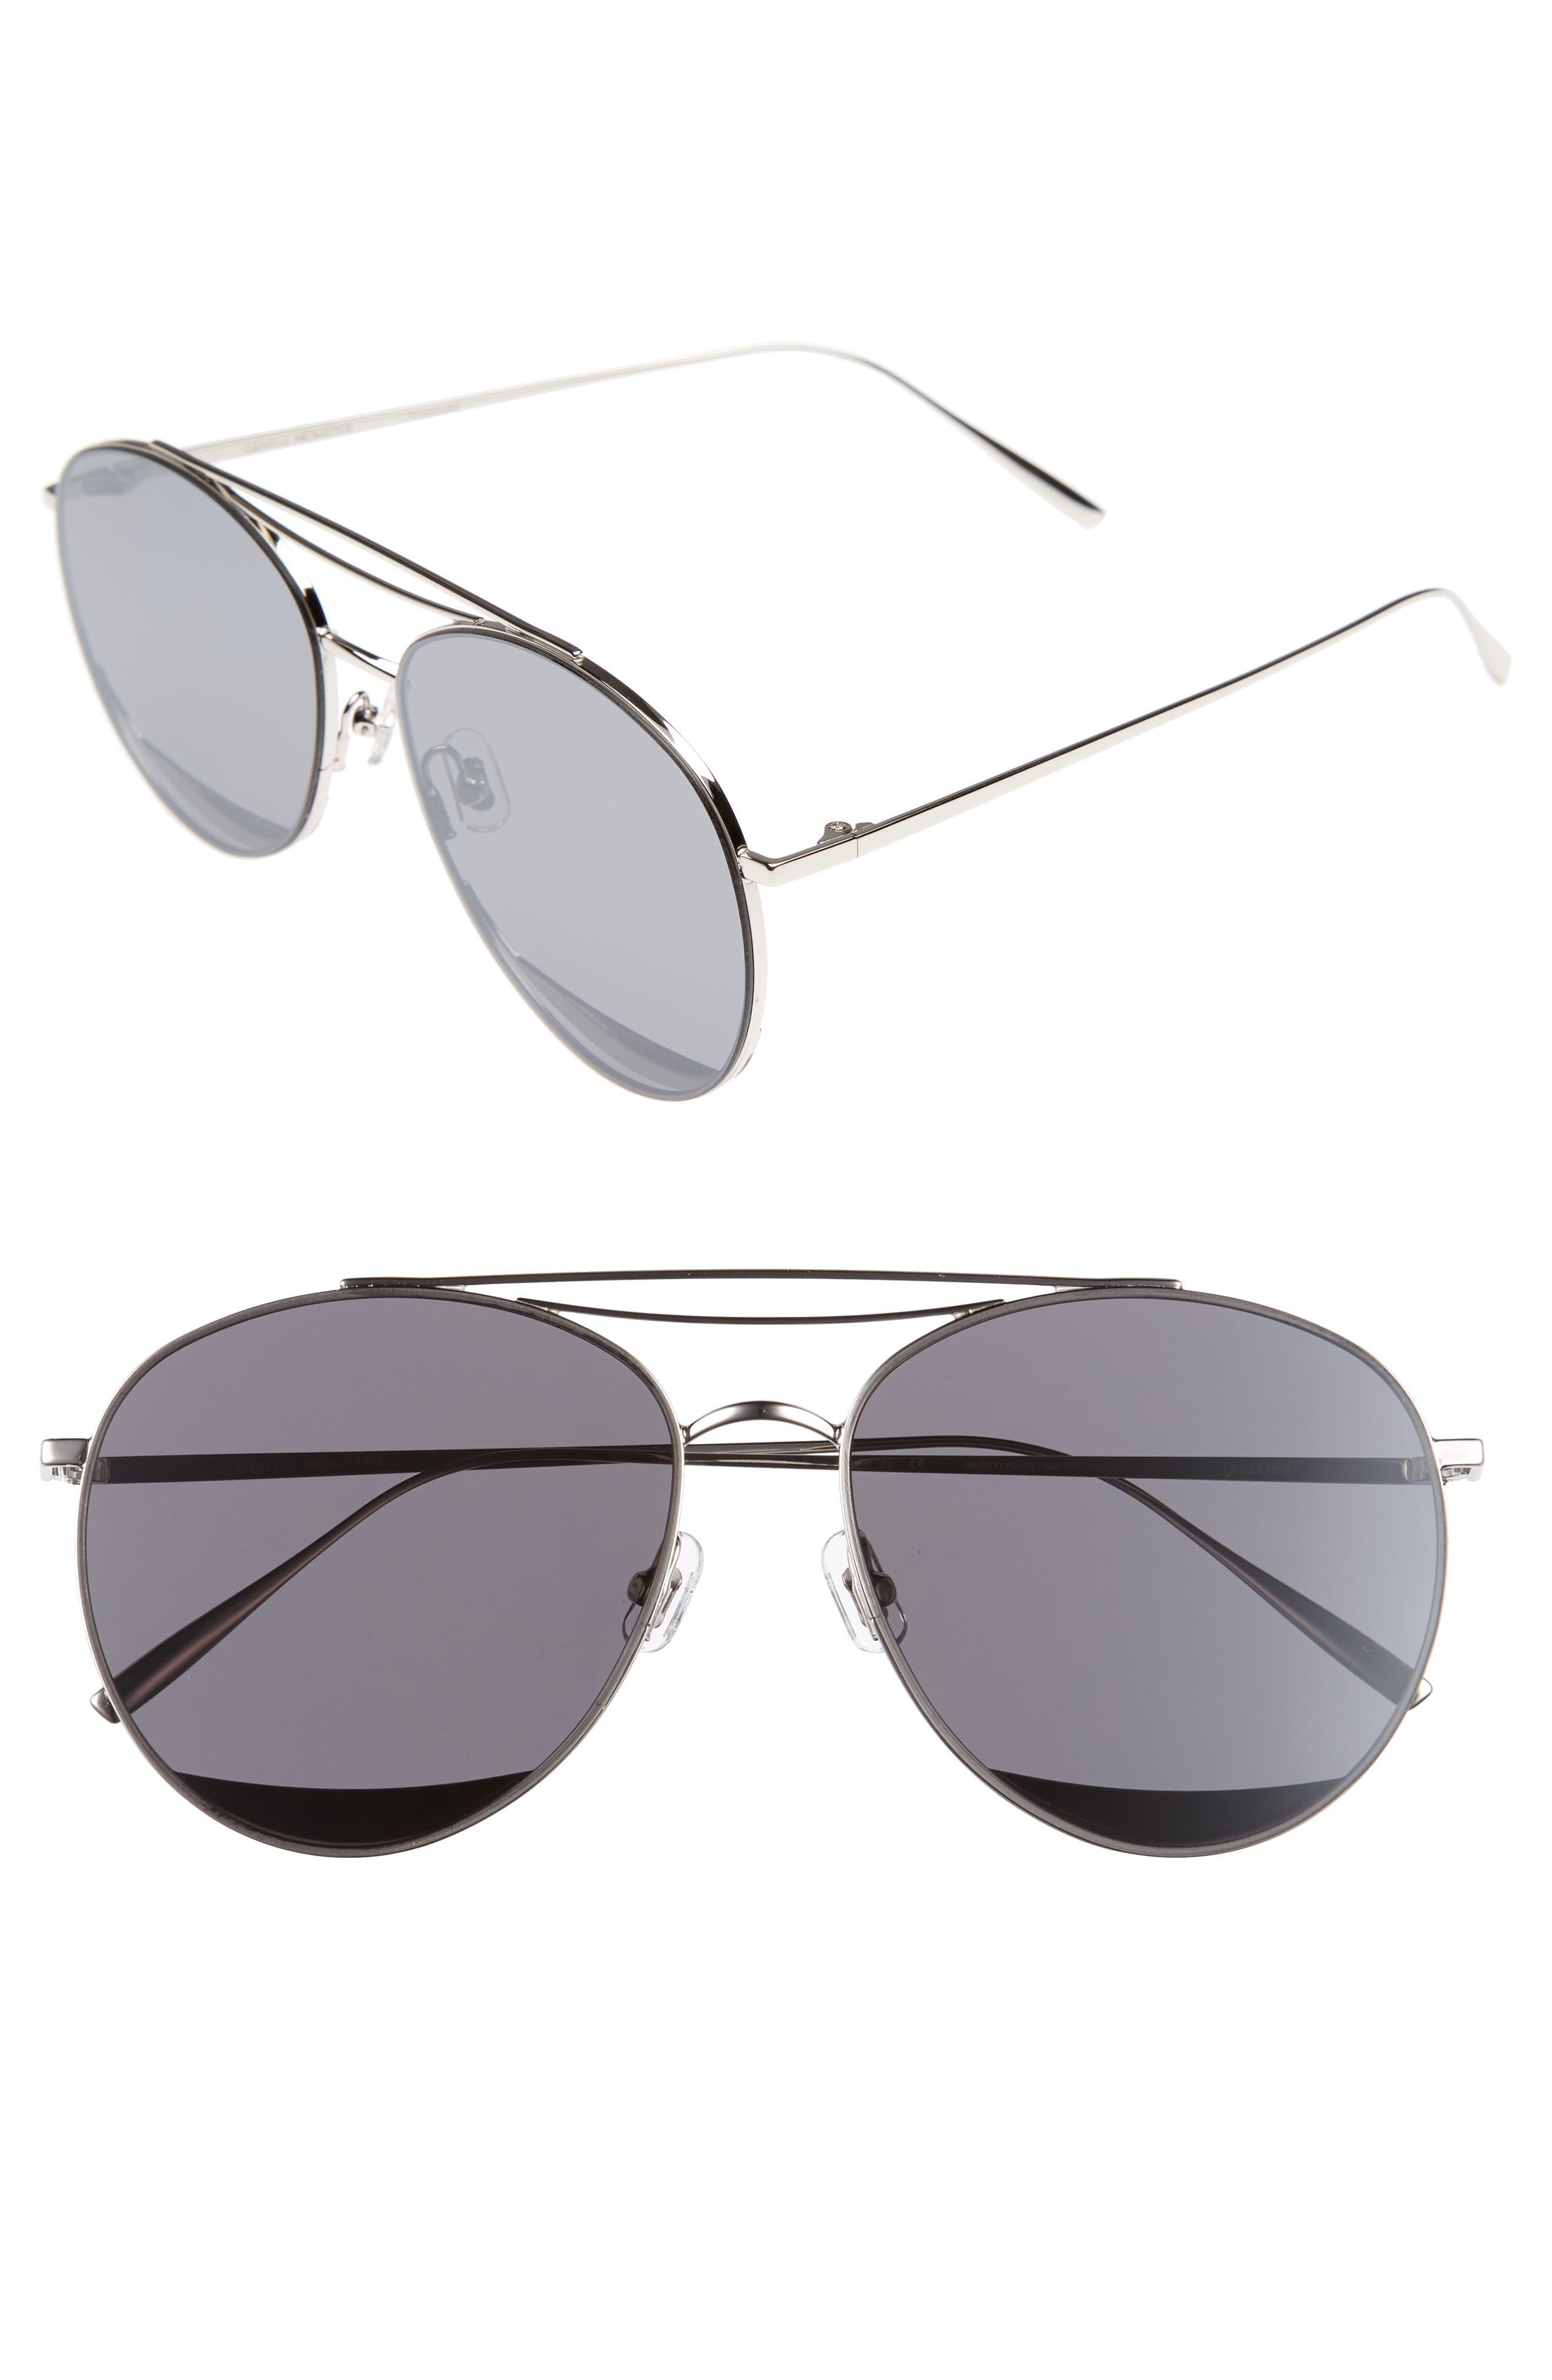 Odd Odd 61mm Aviator Sunglasses,                         Main,                         color, 040